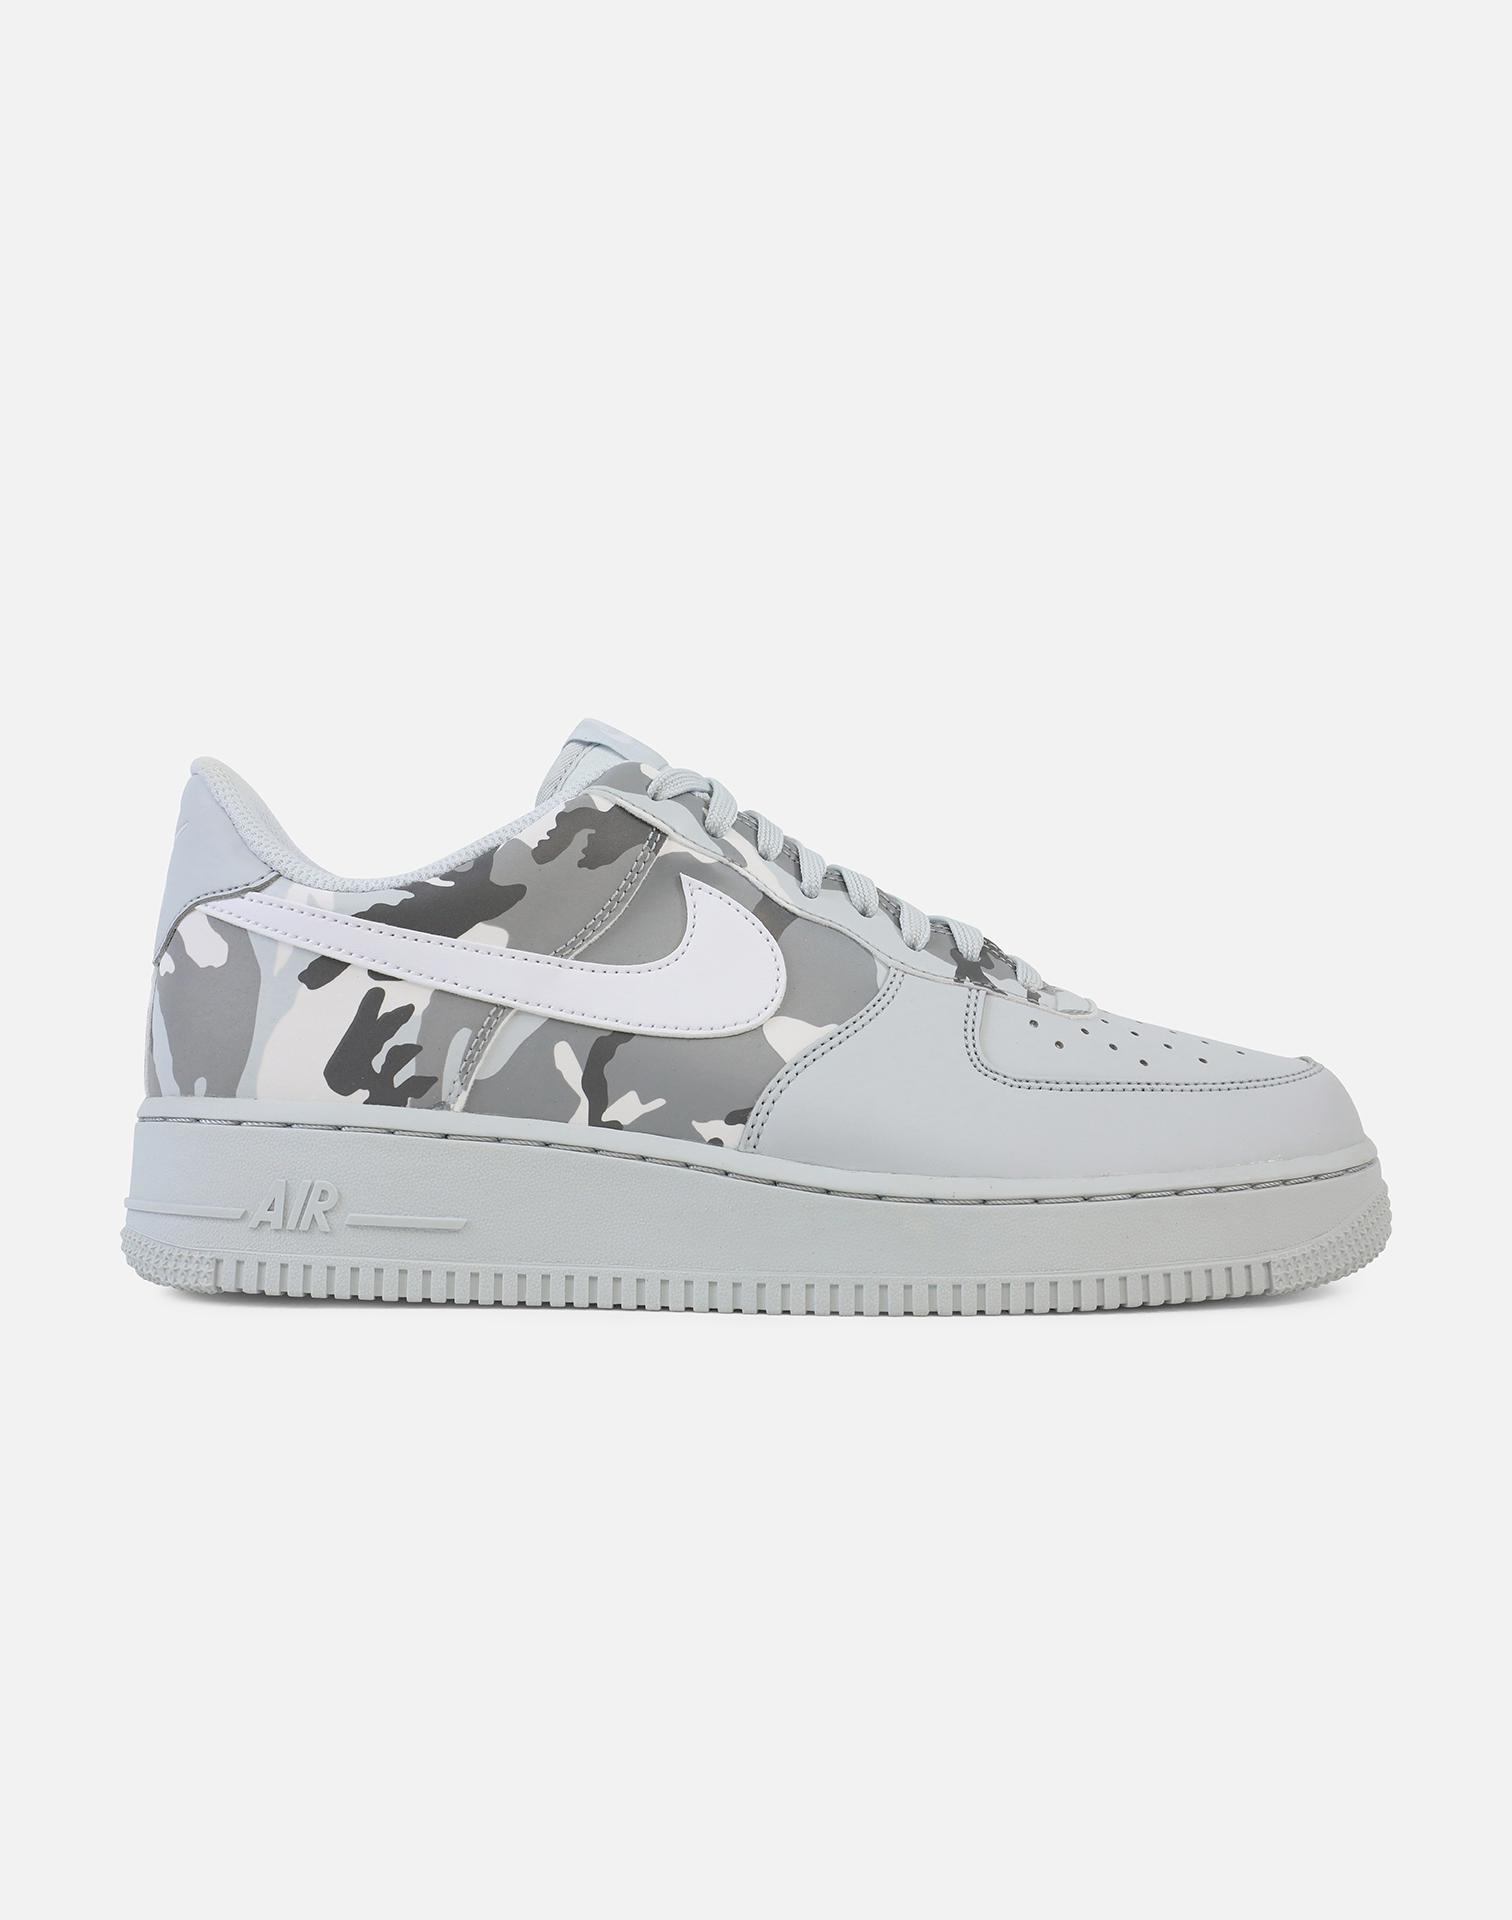 9058b4f3c802 Lyst - Nike Air Force 1 07 Lv8